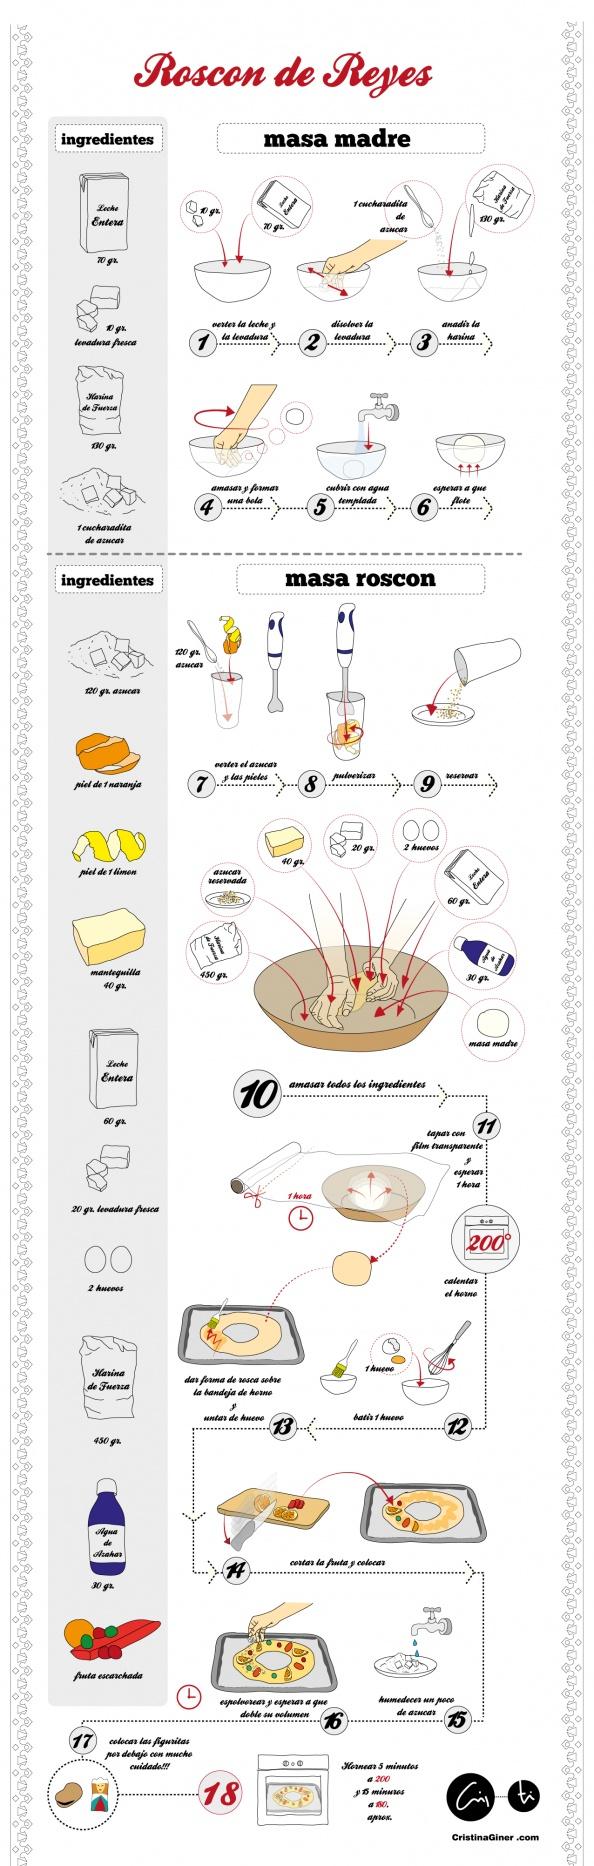 Roscon de Reyes [Recipe] Infographic